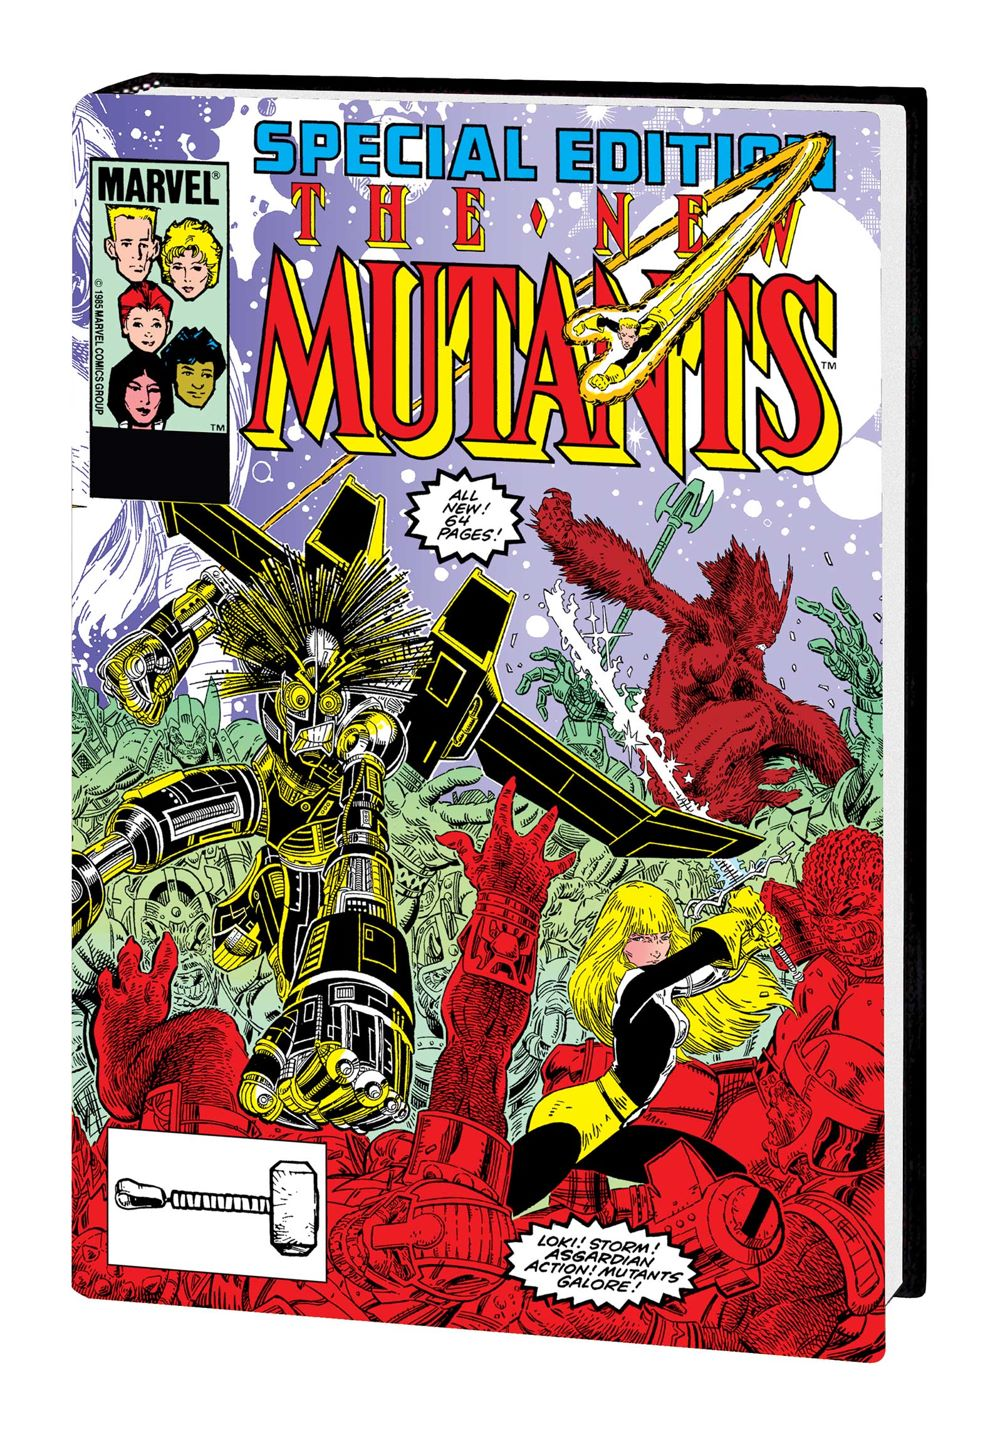 NEW_MUTANTS_VOL_2_OMNI_HC Marvel Comics August 2021 Solicitations